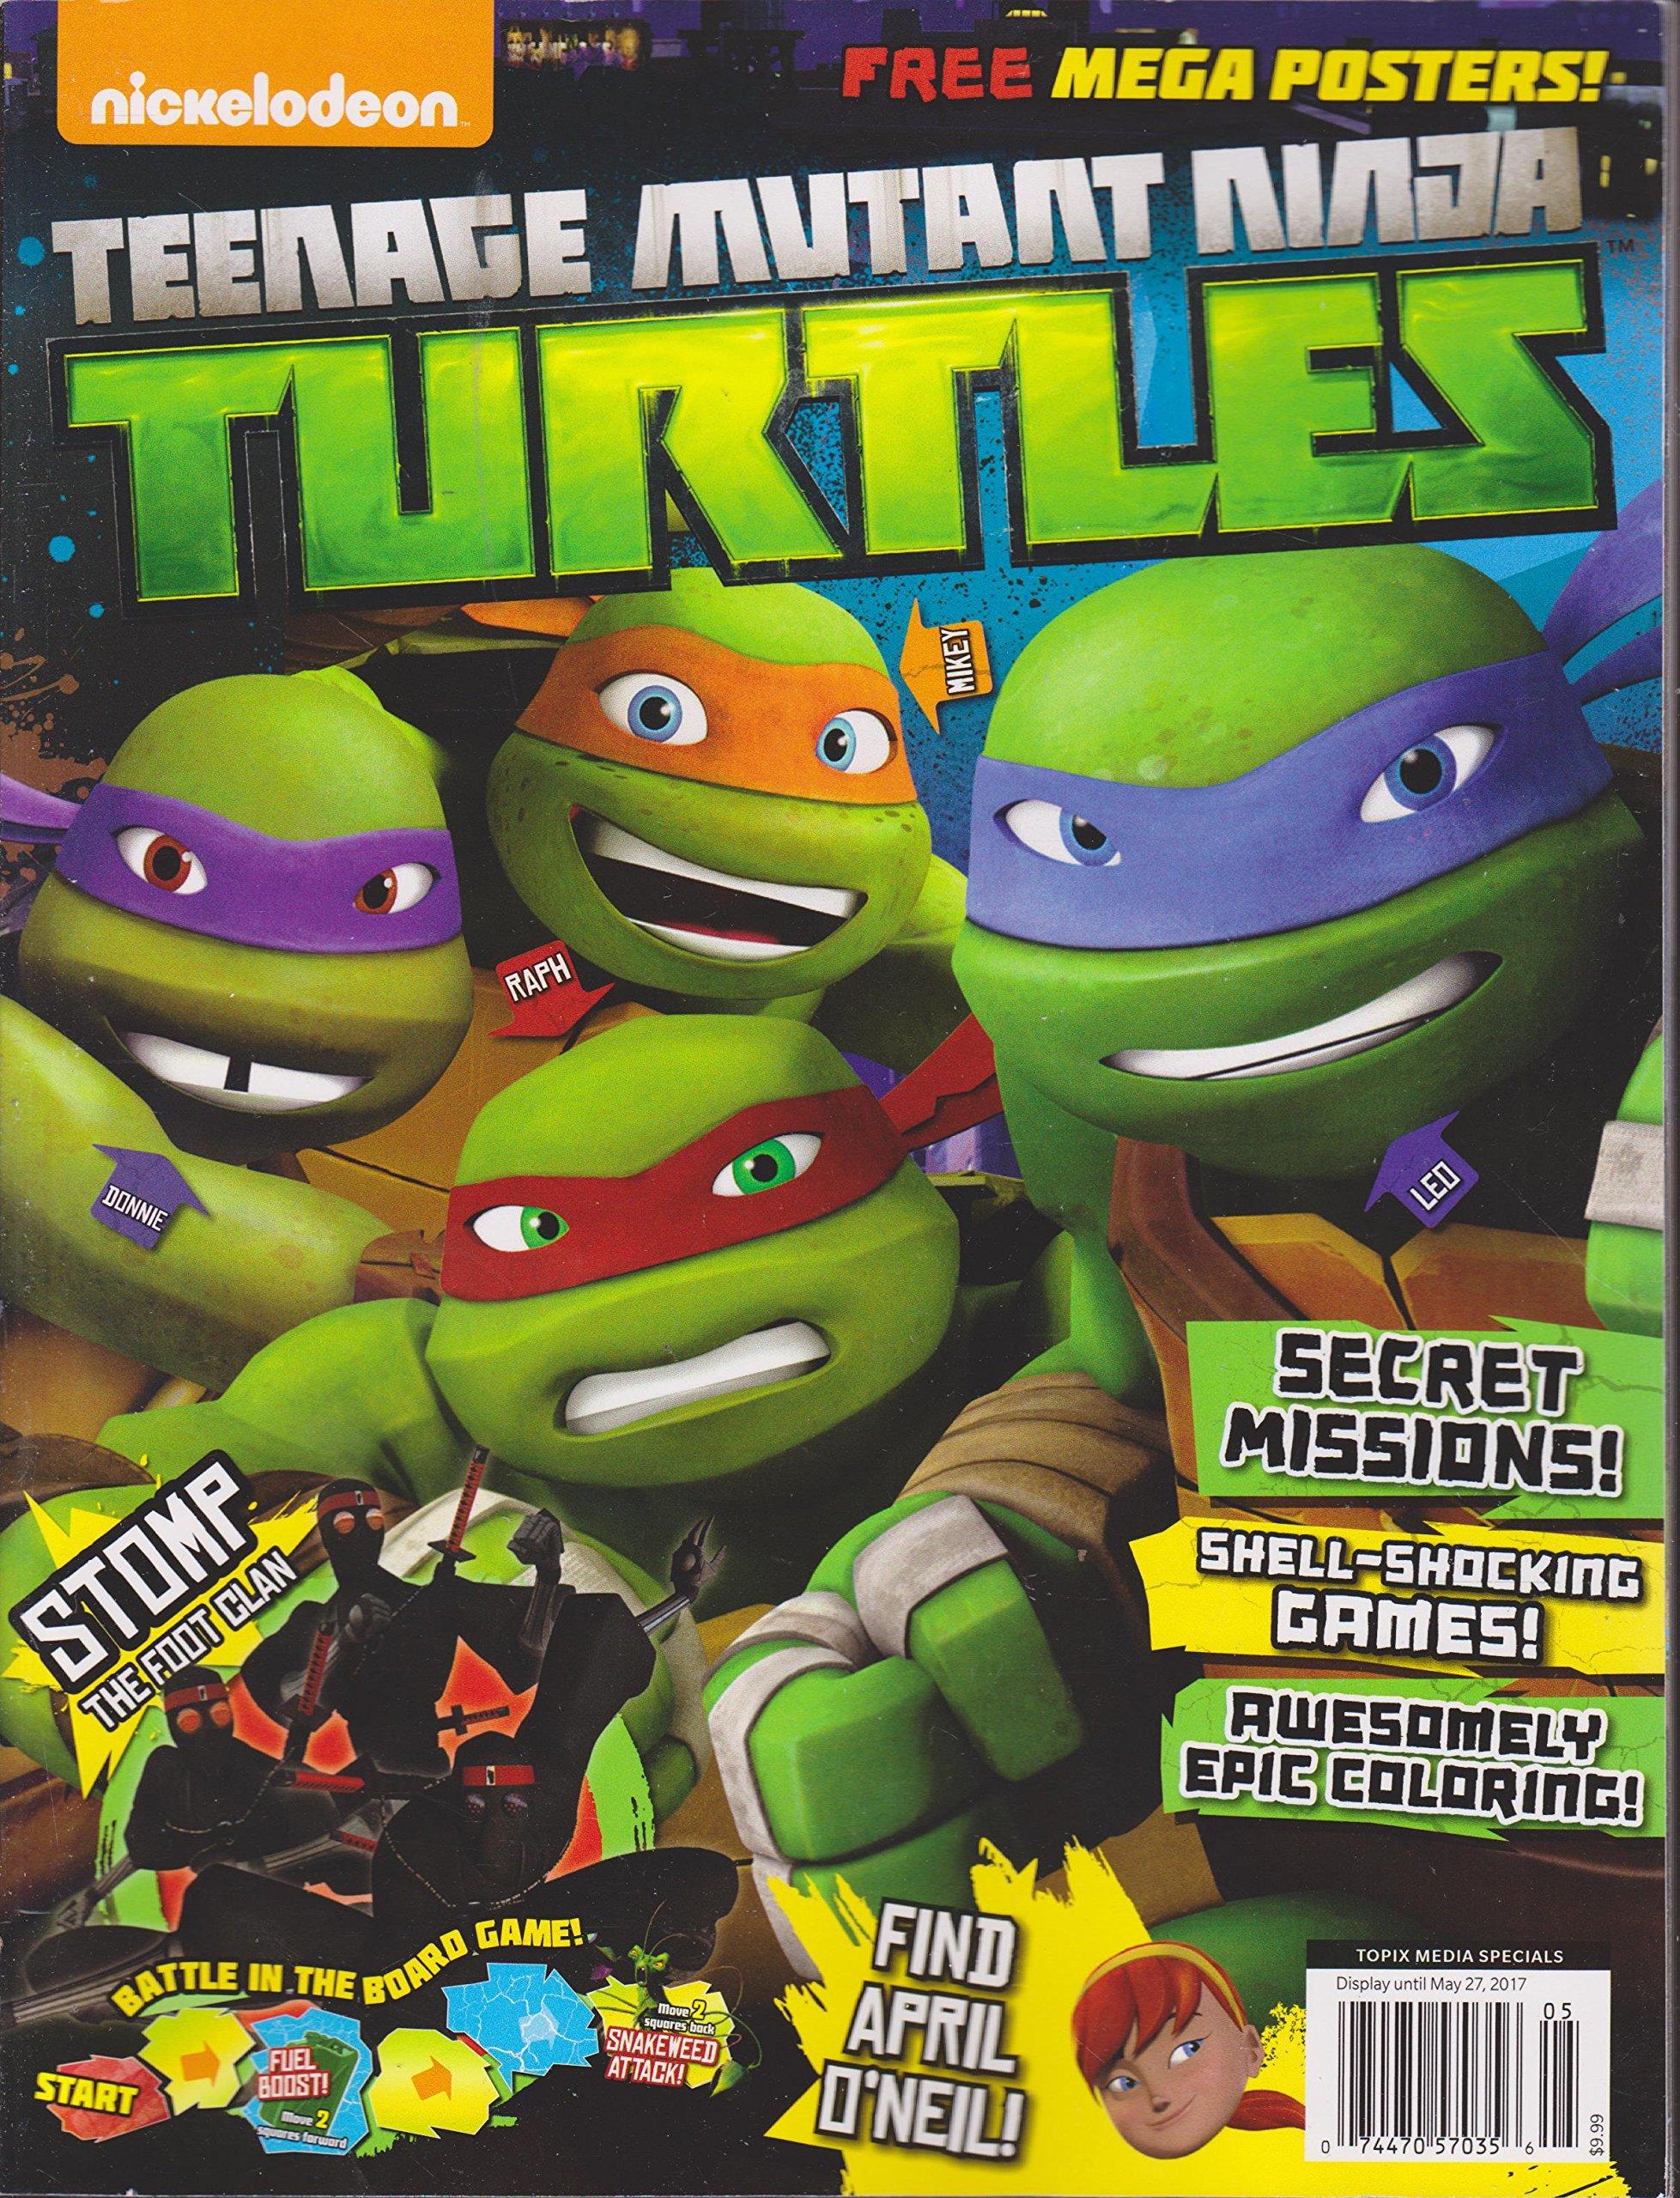 Nickelodeon Teenage Mutant Ninja Turtles Magazine 2017 ...